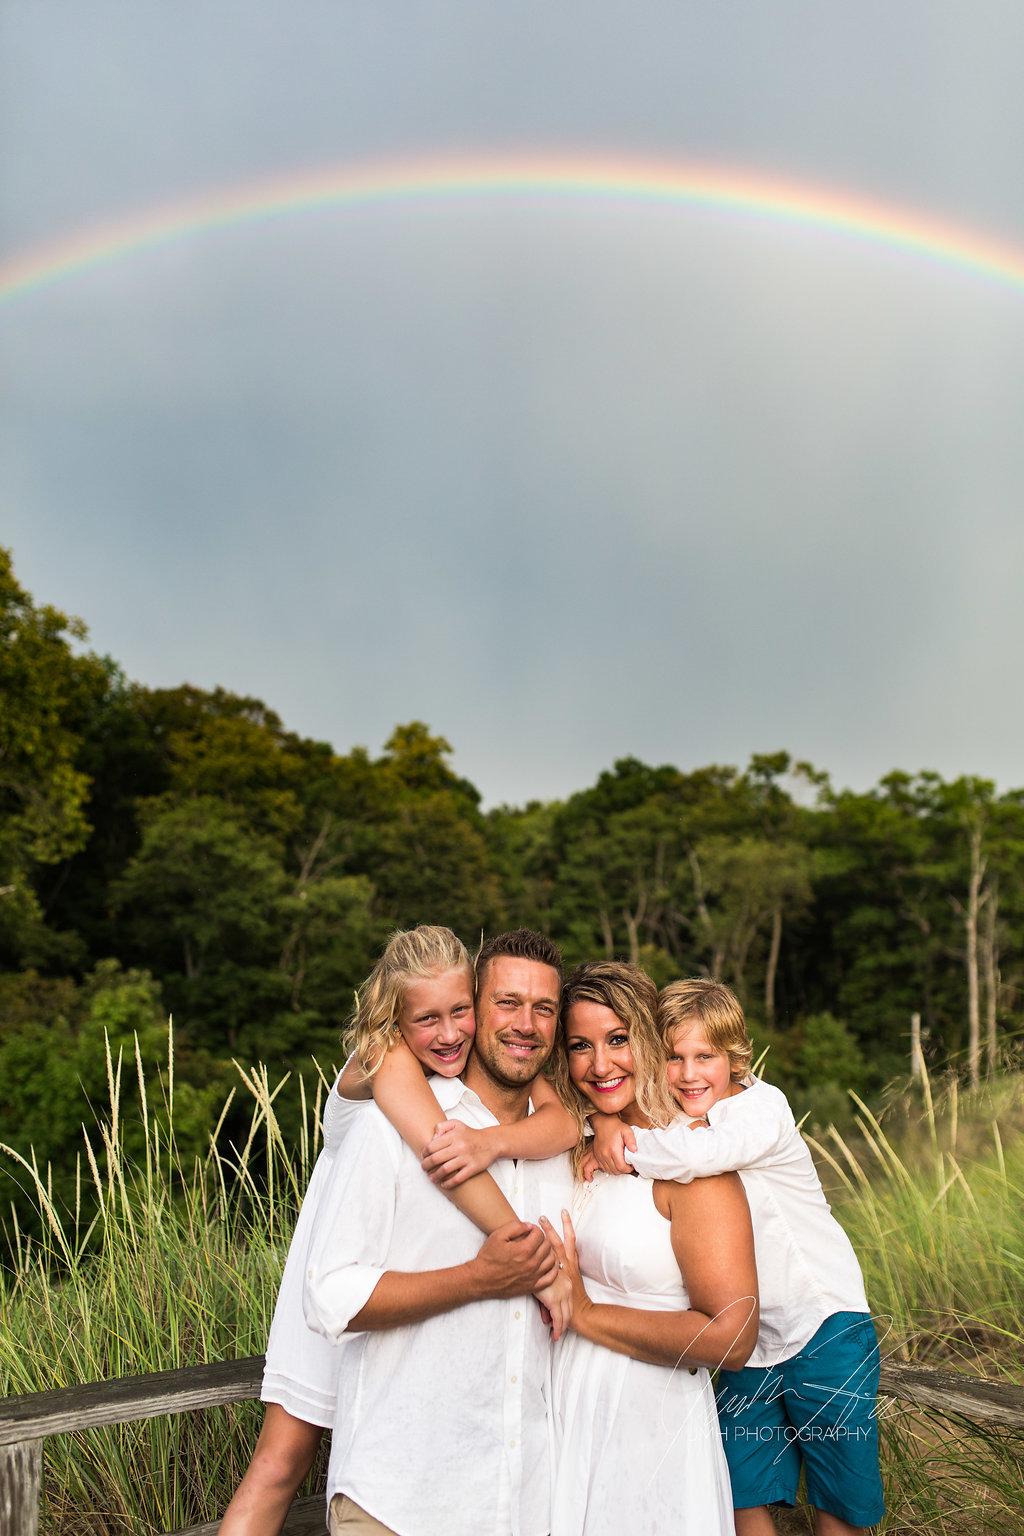 JMH_photography_grandrapidsphotographer_michigan_wedding_photographer-4.jpg